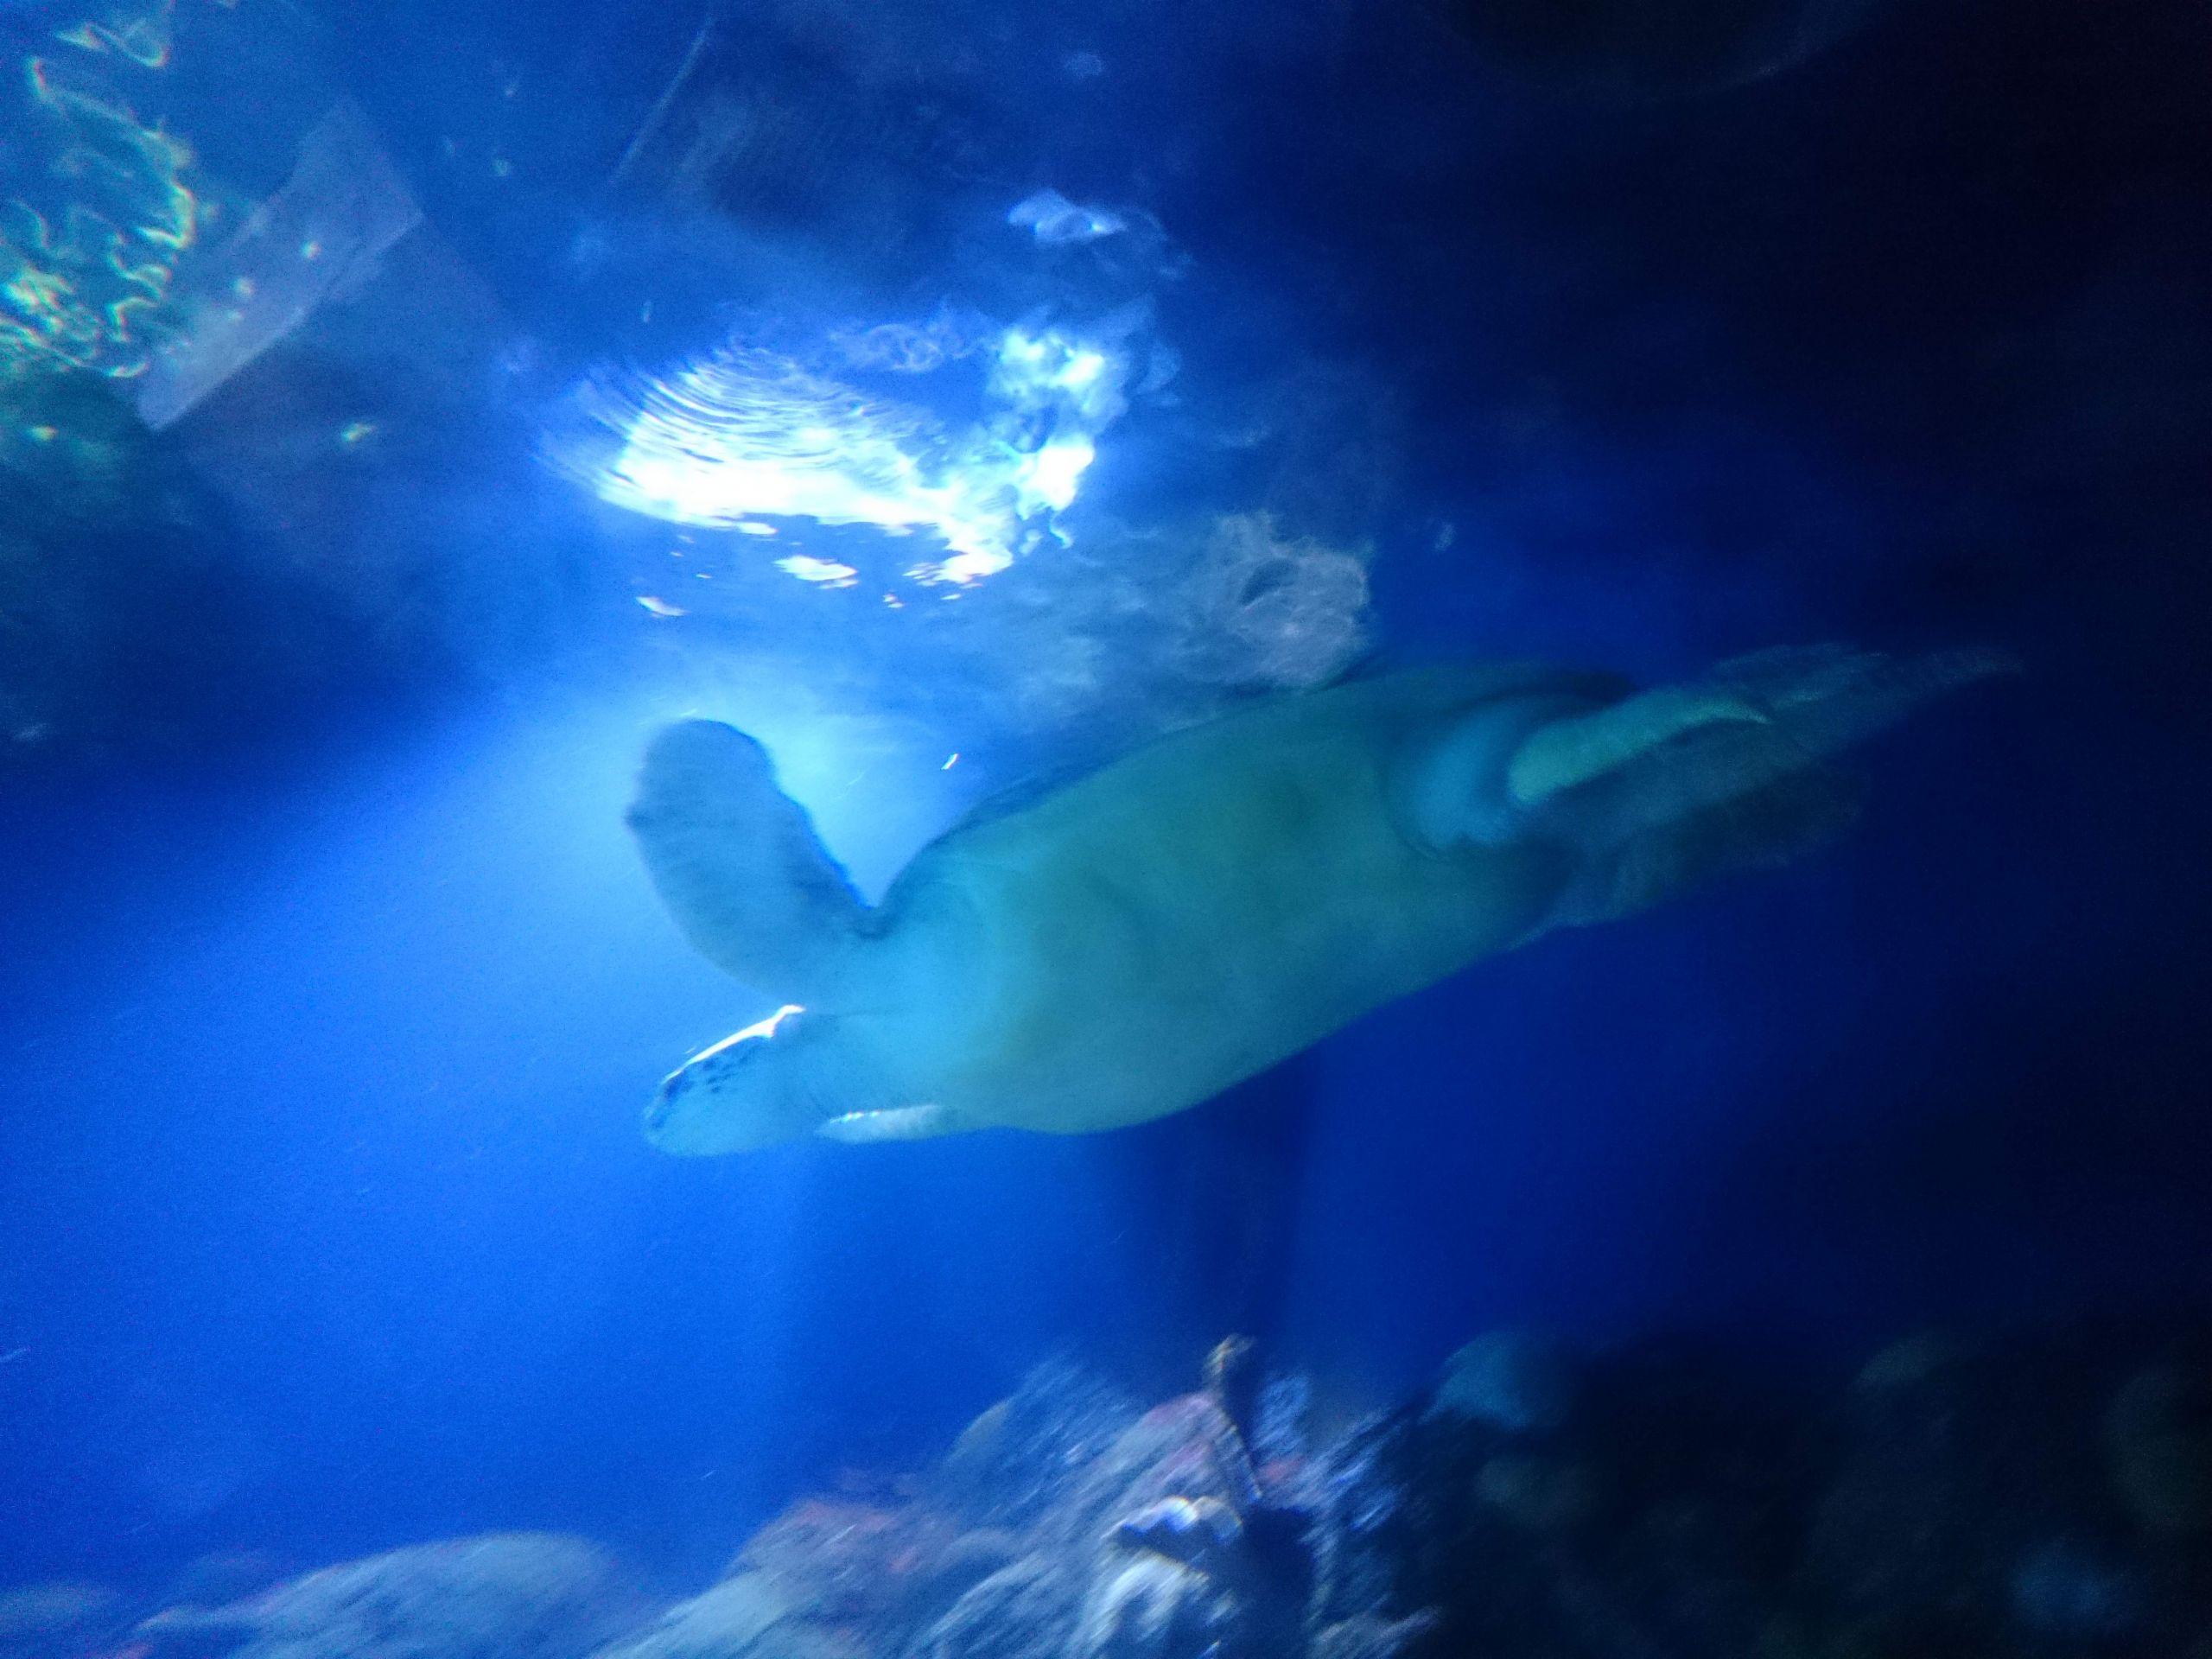 herrenhaeuser gaerten hannover und sea life